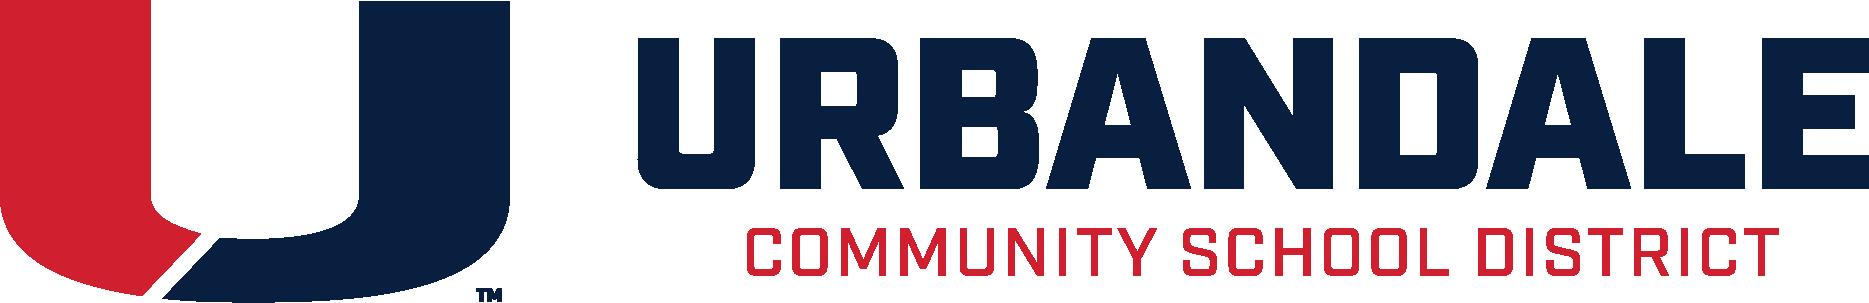 Urbandale Community School District logo